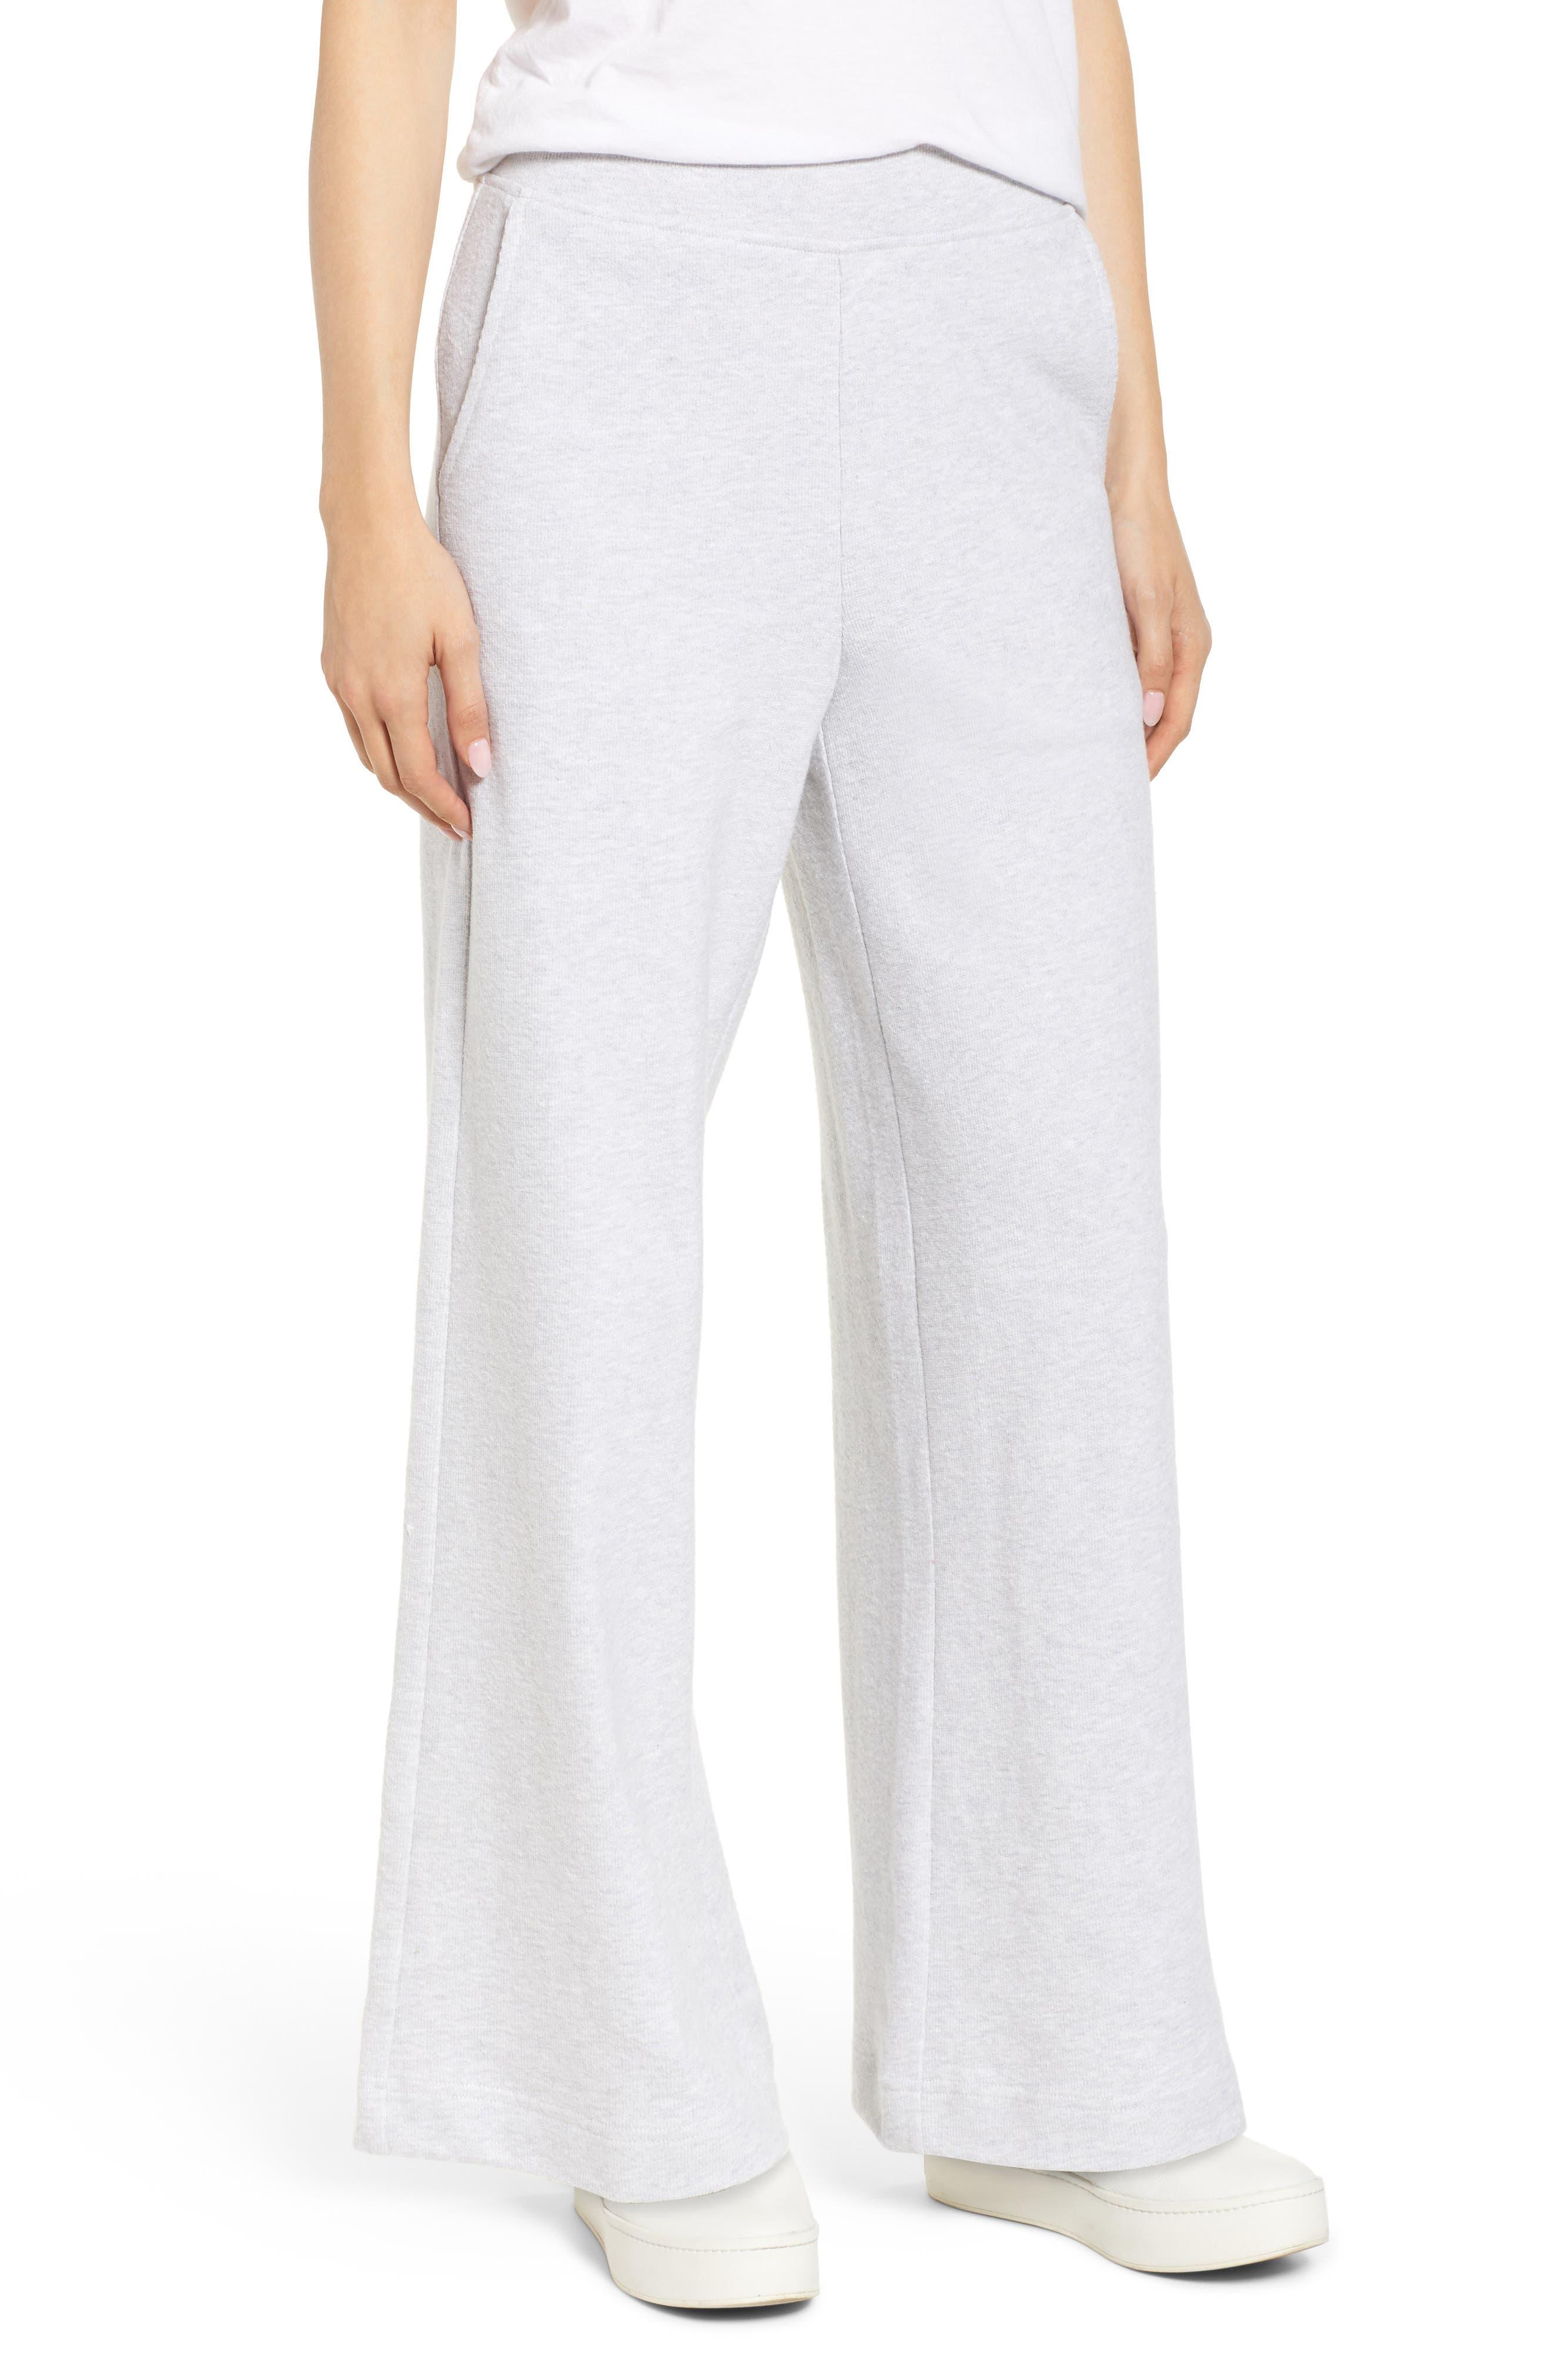 Lou & Grey Conscious Cotton Wide Leg Sweatpants, Grey